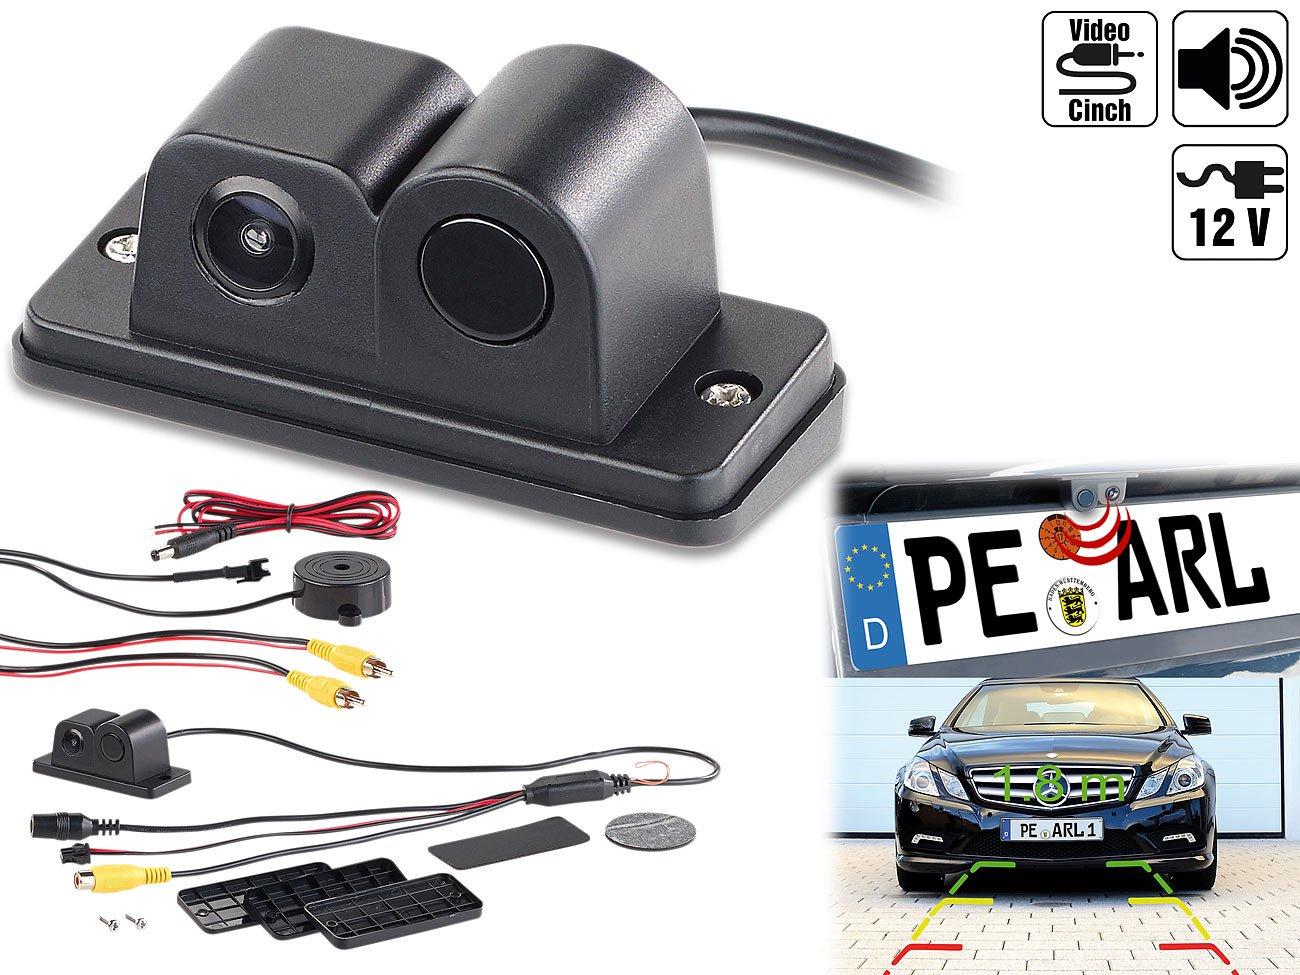 Lescars-Rckfahrkameras-Farb-Rckfahrkamera-und-Einparkhilfe-90-Bildwinkel-Abstandswarner-Parkhilfe